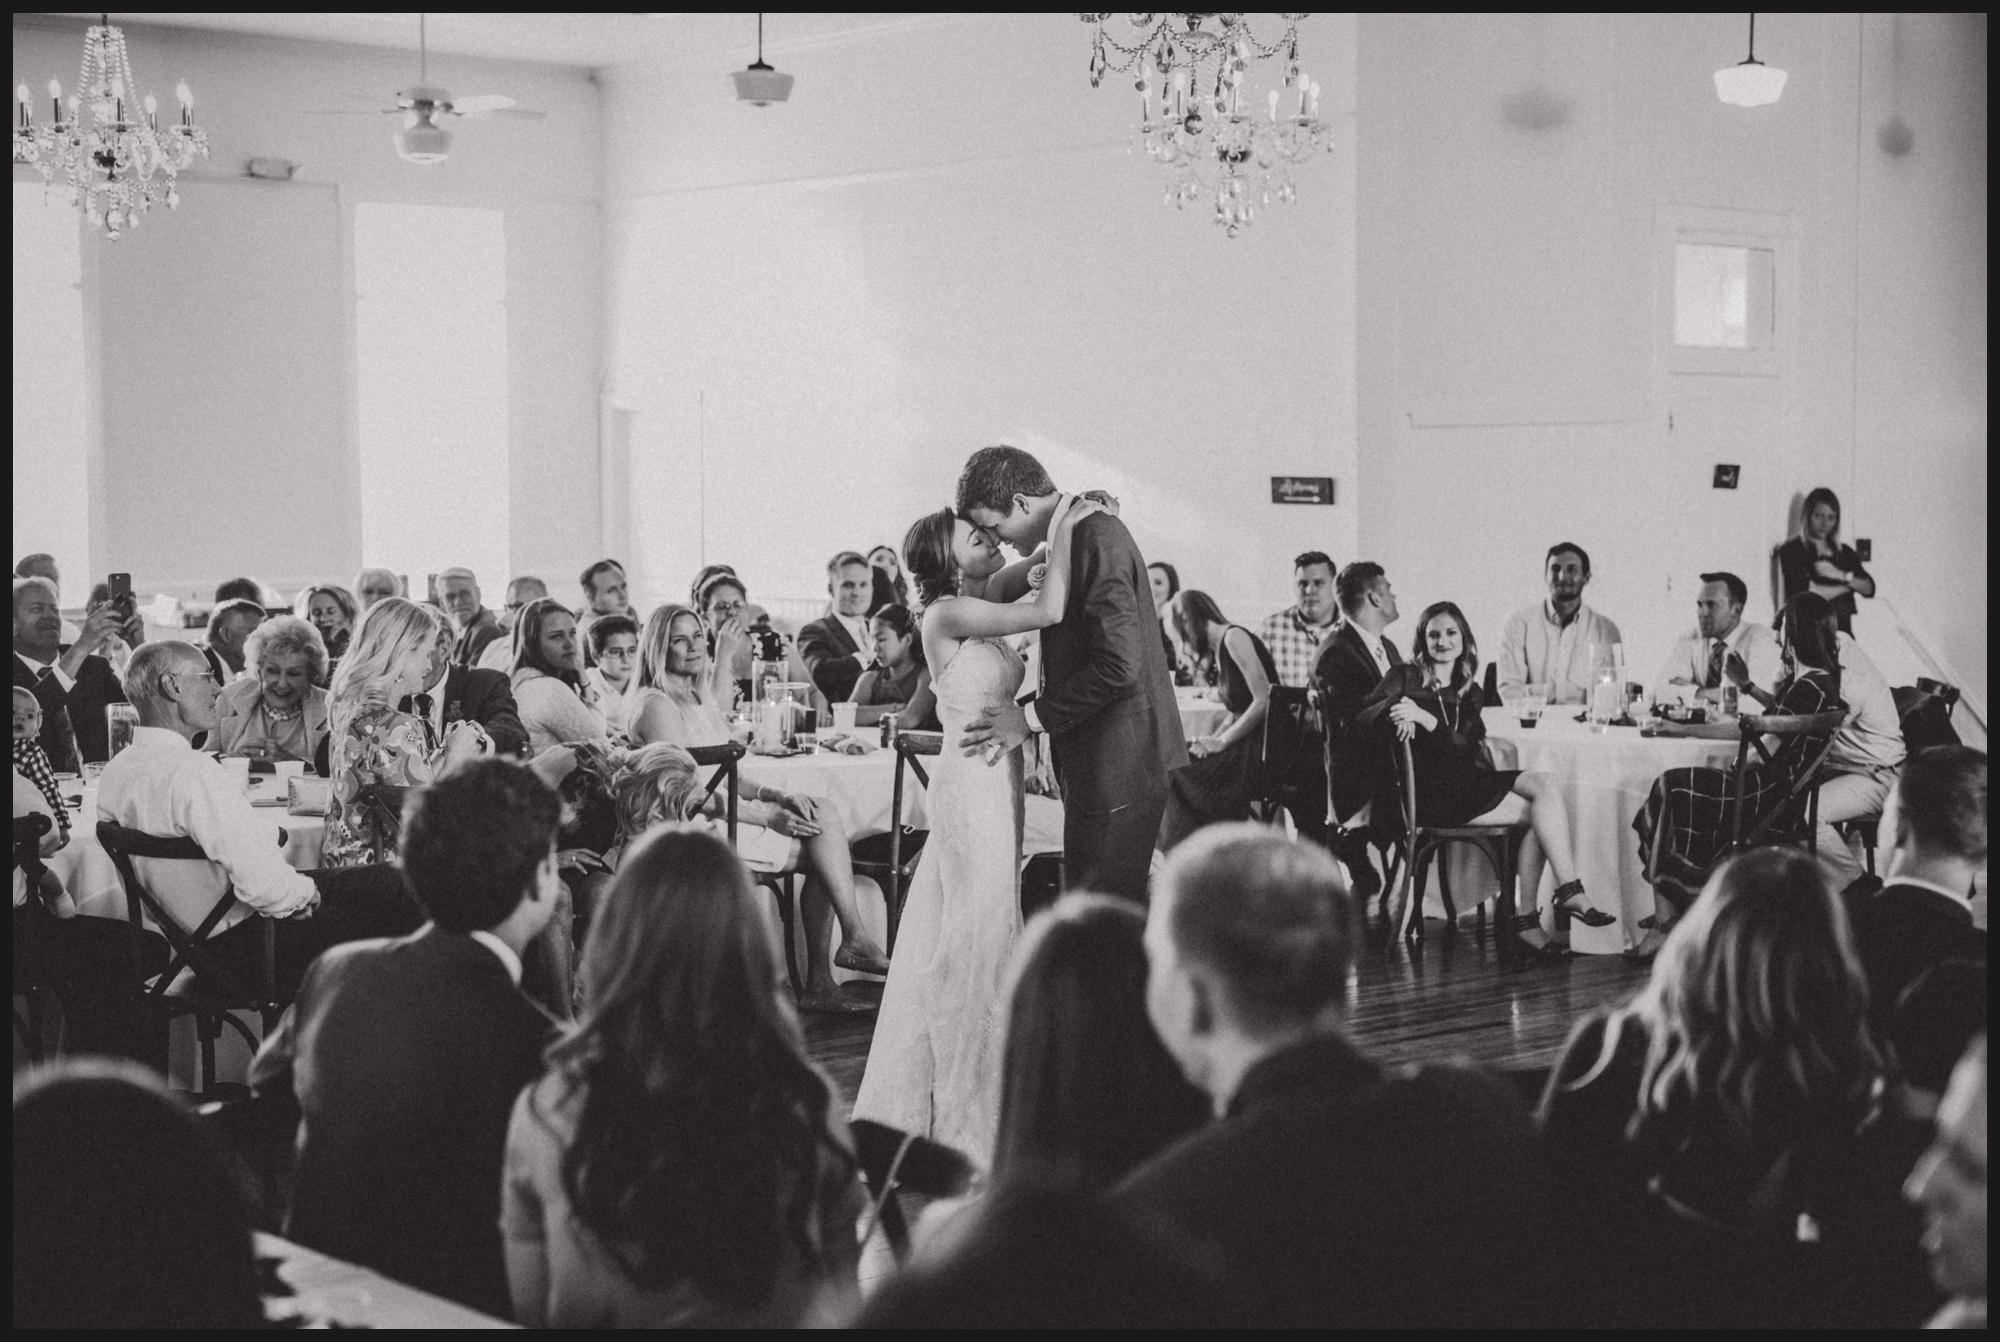 Orlando-Wedding-Photographer-destination-wedding-photographer-florida-wedding-photographer-bohemian-wedding-photographer_1775.jpg